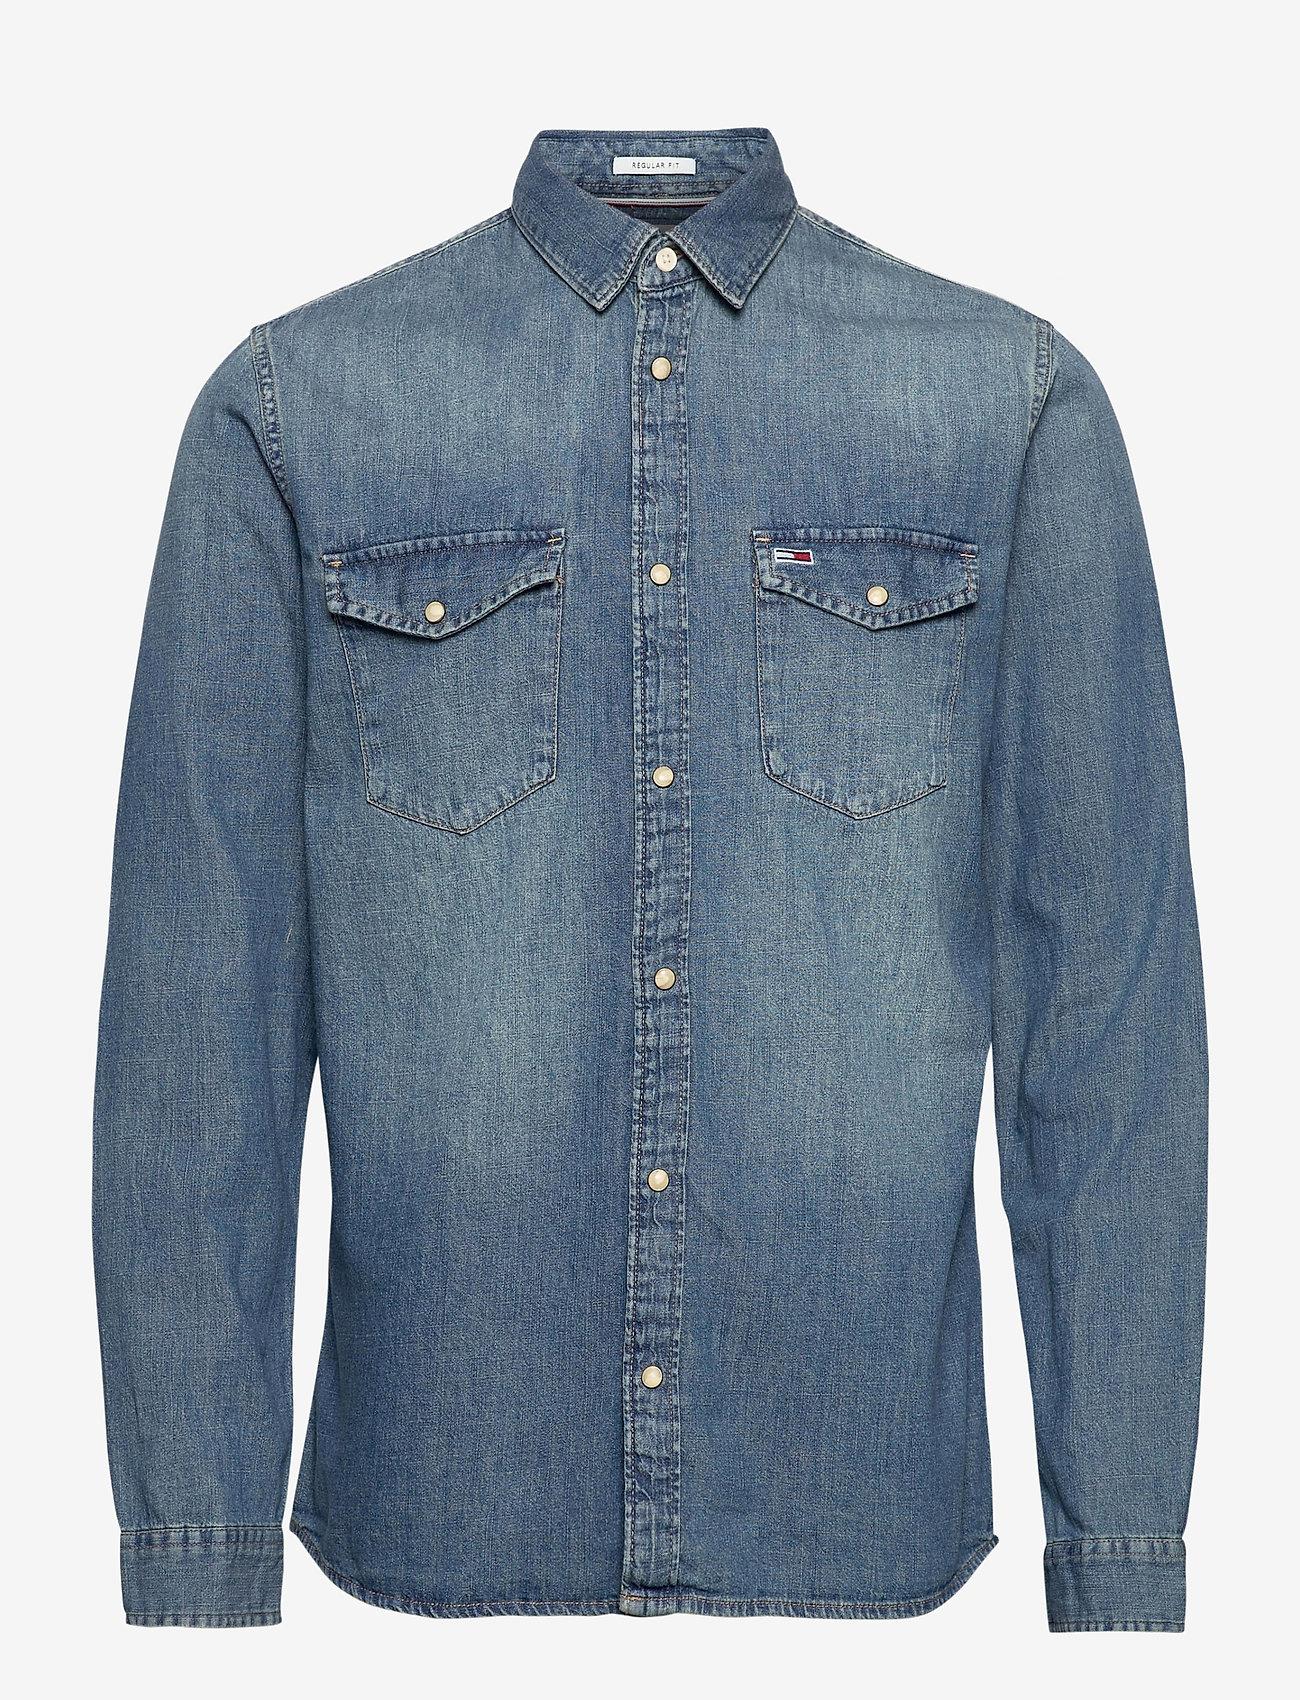 Tommy Jeans - TJM WESTERN DENIM SHIRT - basic shirts - mid indigo - 0